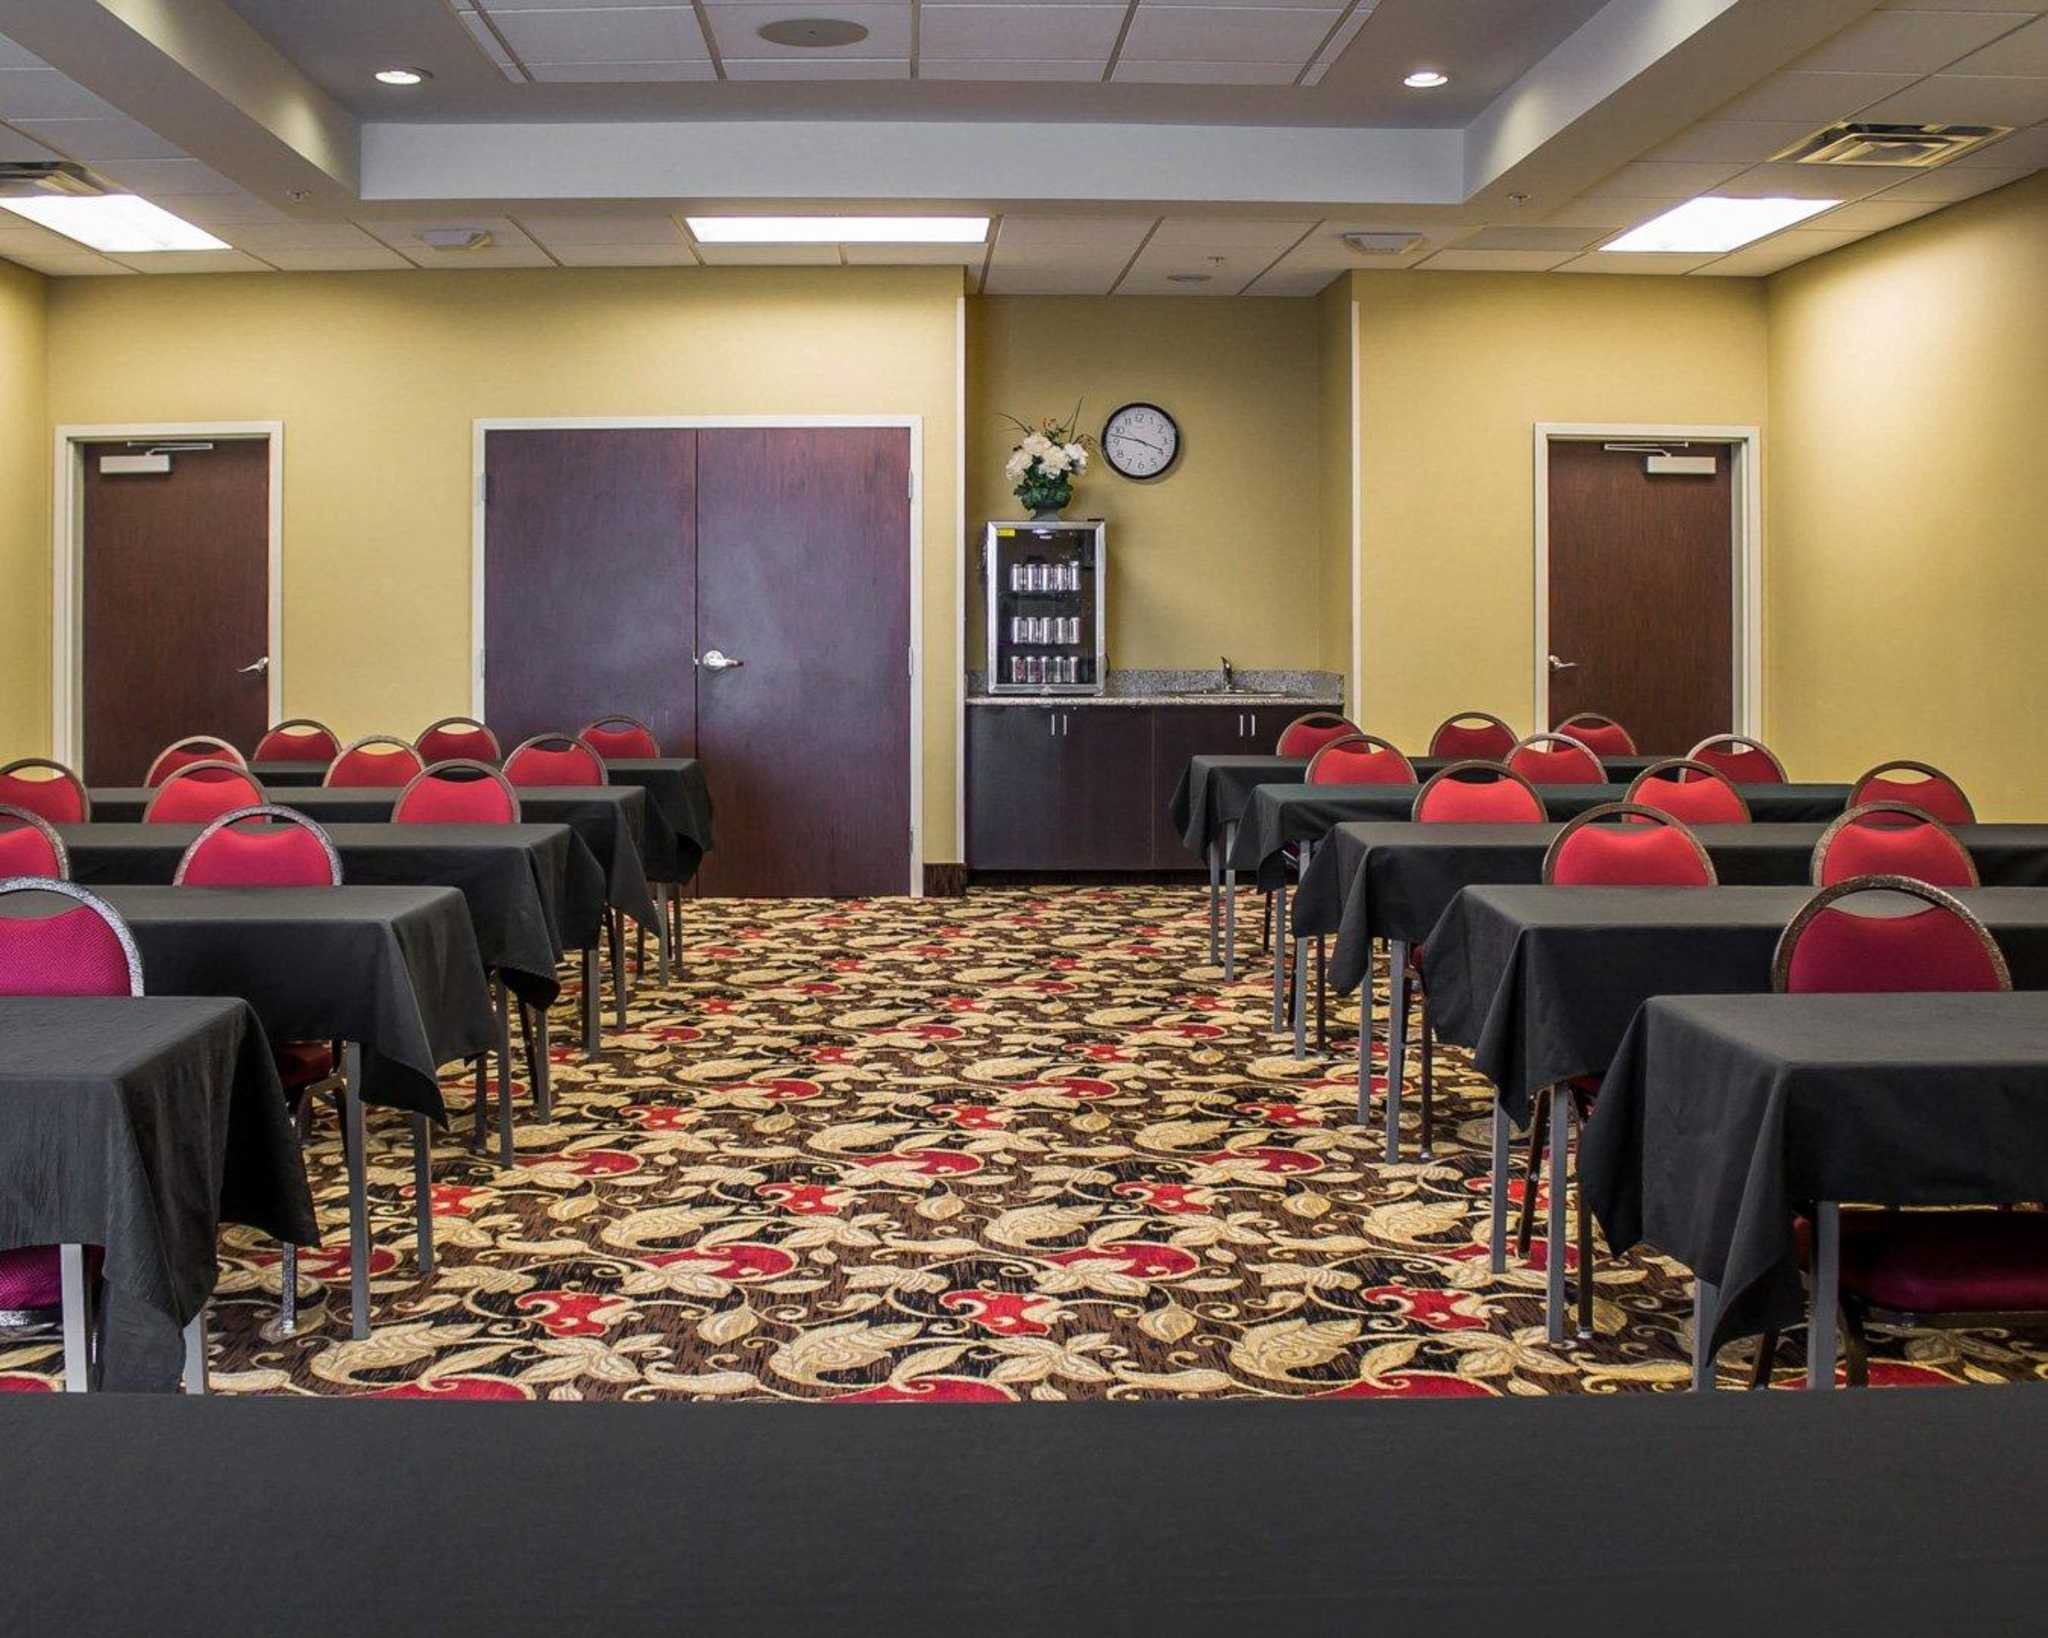 Comfort Suites East Broad at 270 image 46